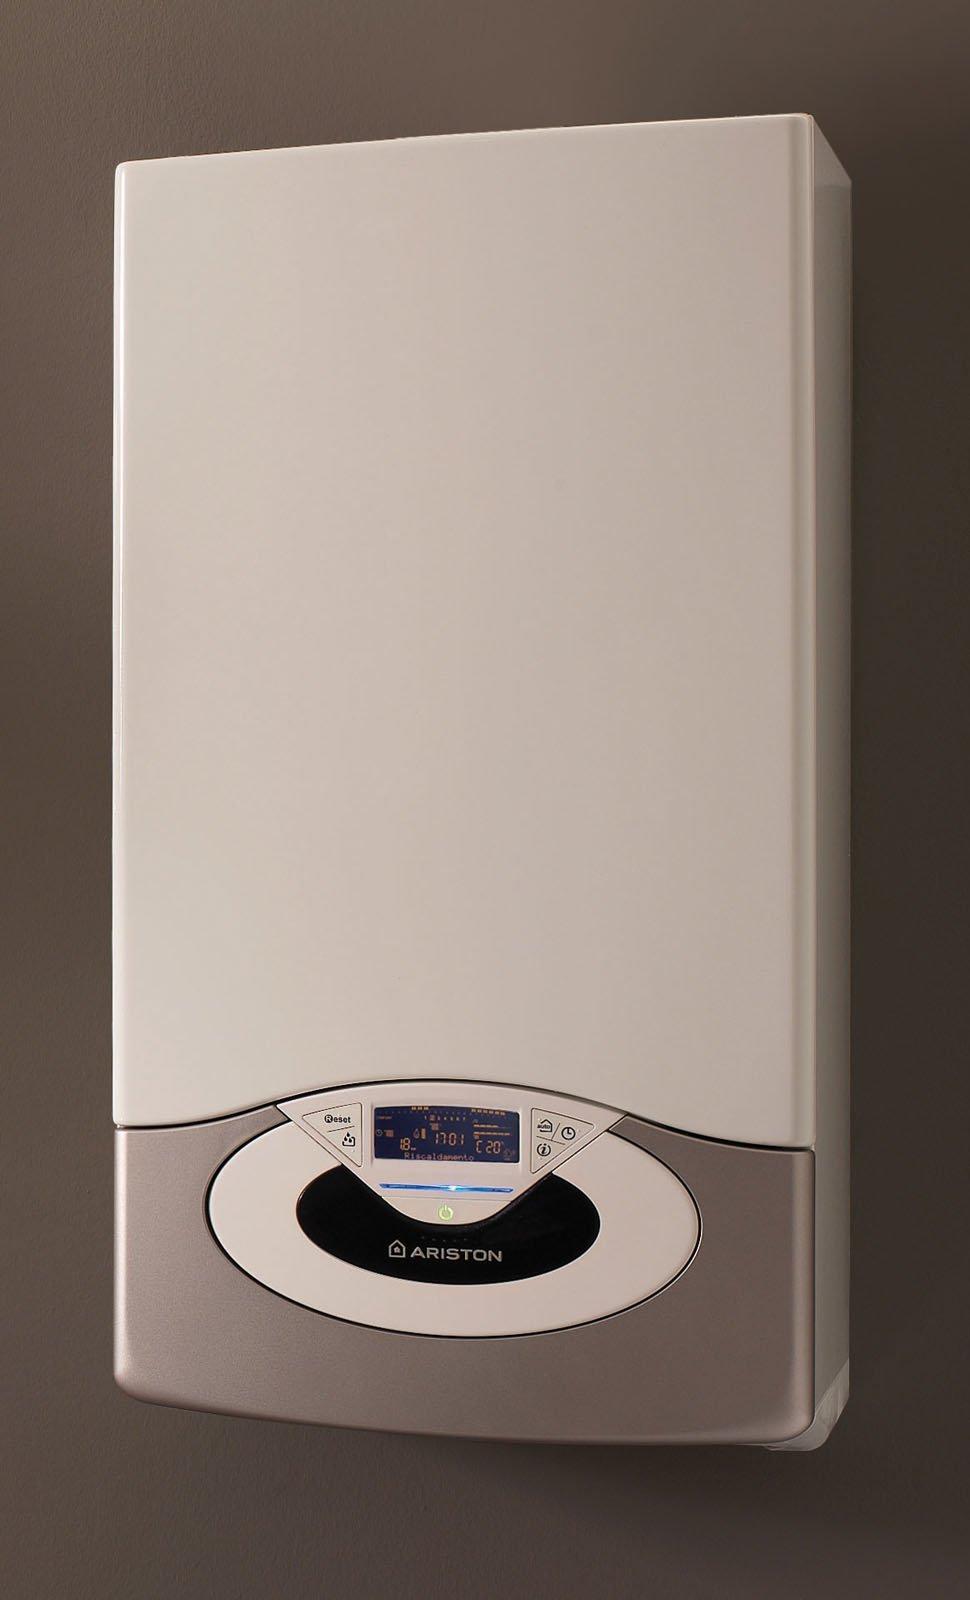 Sostituire la caldaia cose di casa for Caldaia ariston manuale